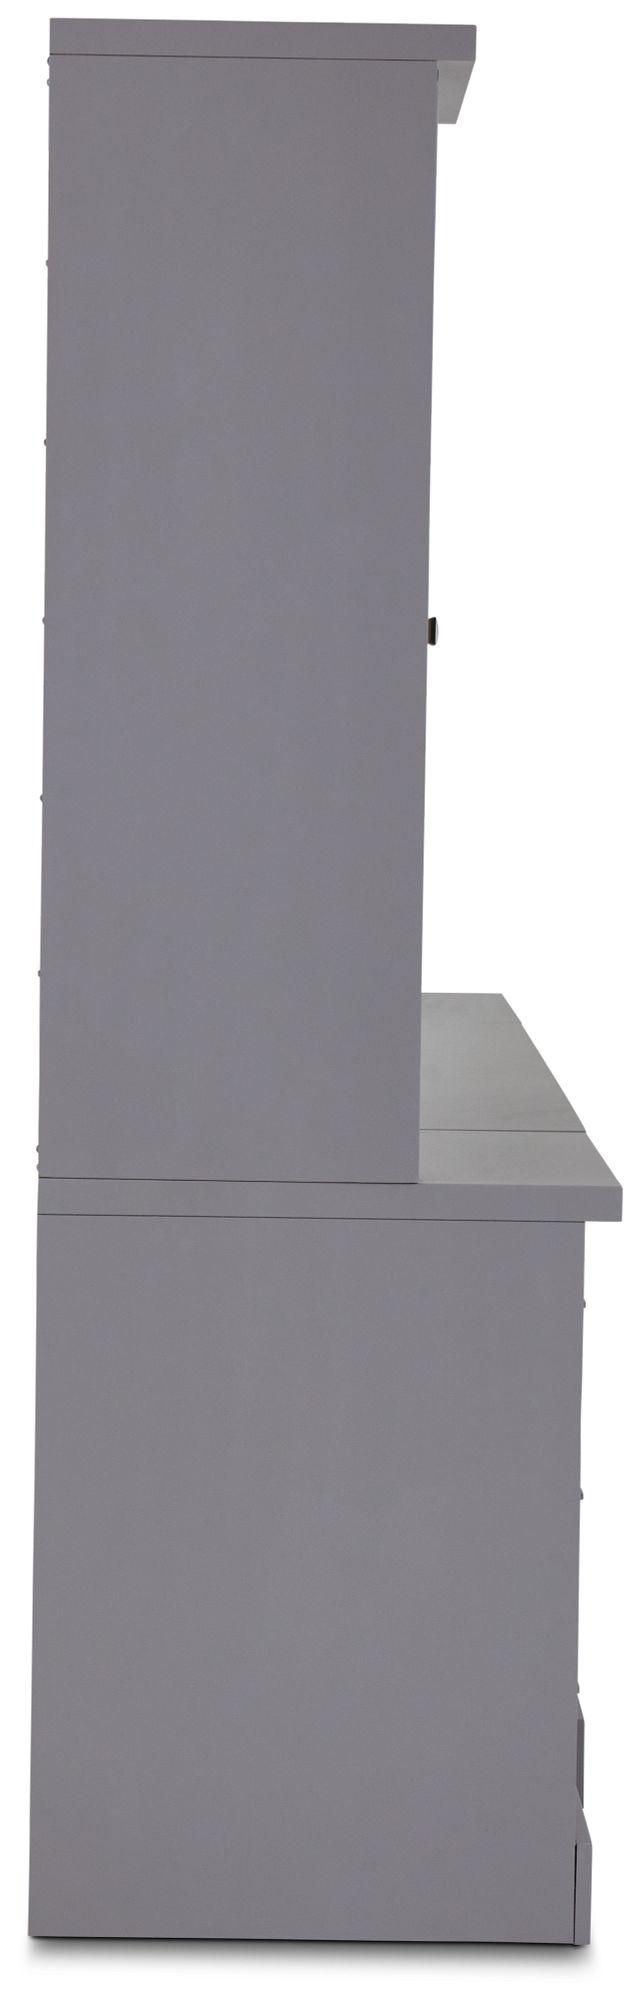 Newport Gray Drawer Wall Desk (3)